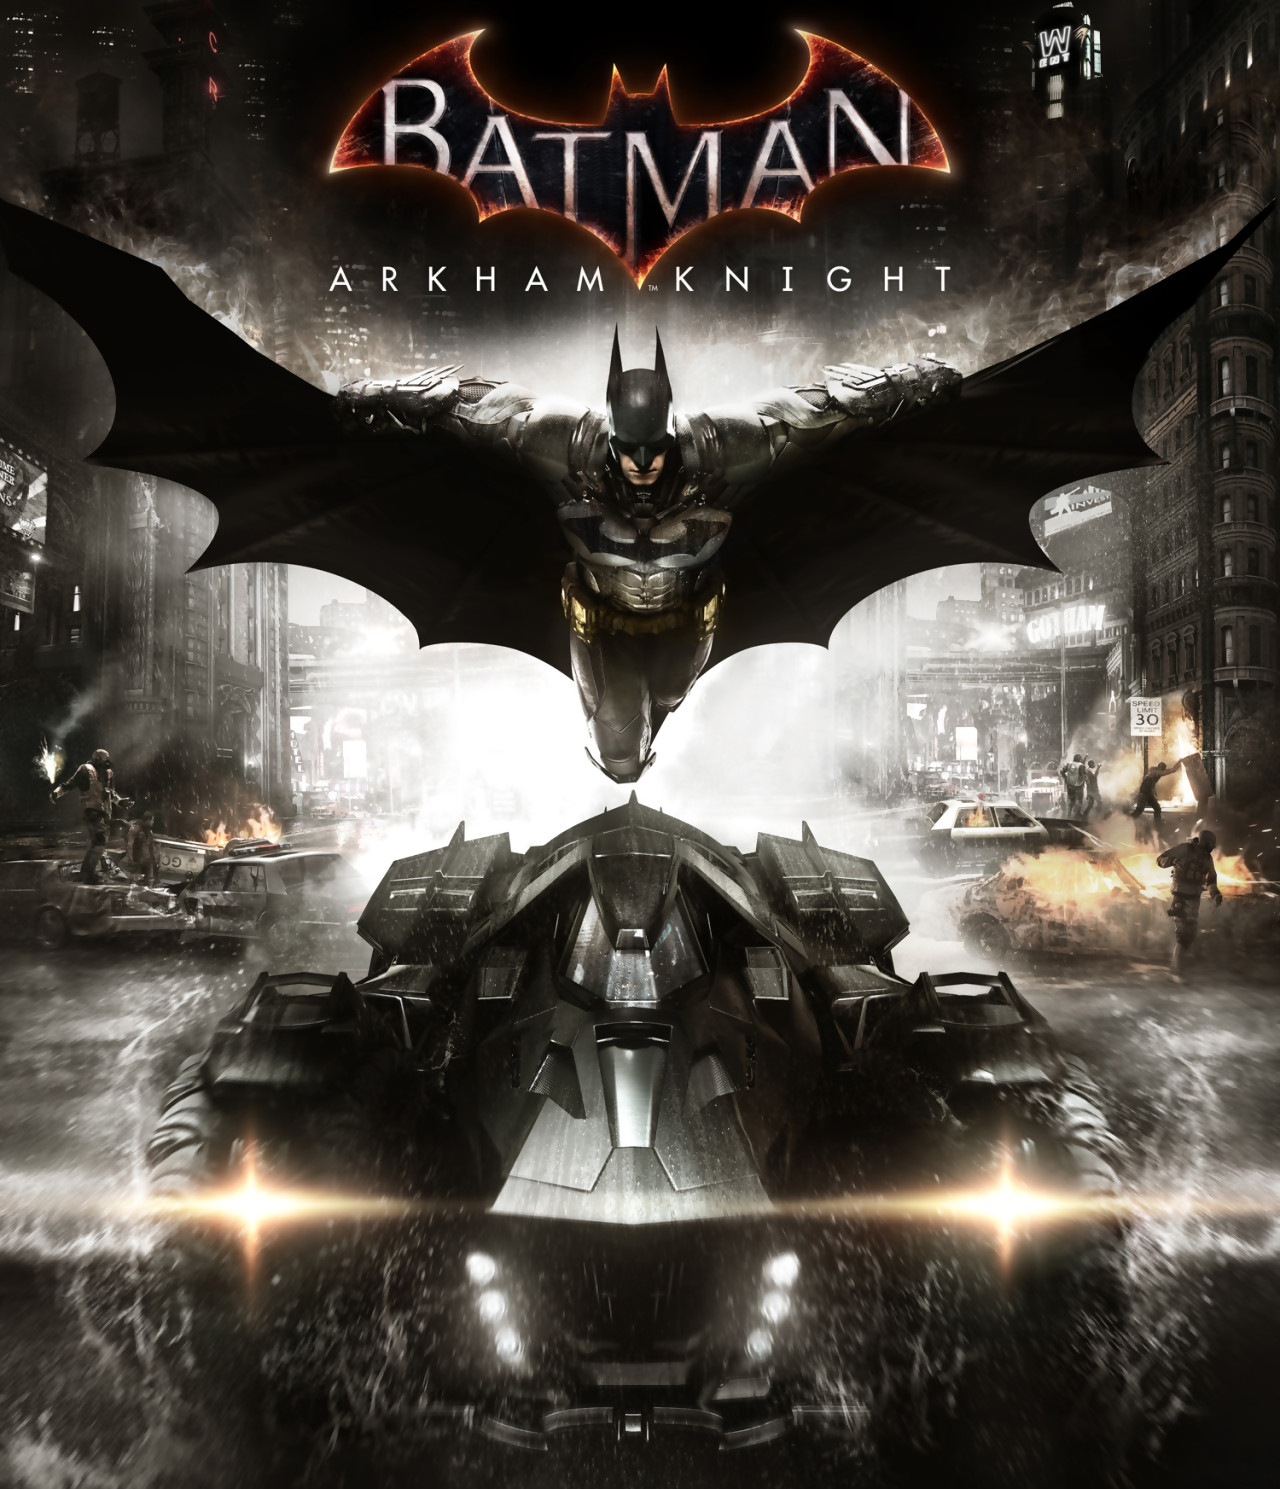 Batman - Page 3 Batman-arkham-knight-artw-5316135a4cda8